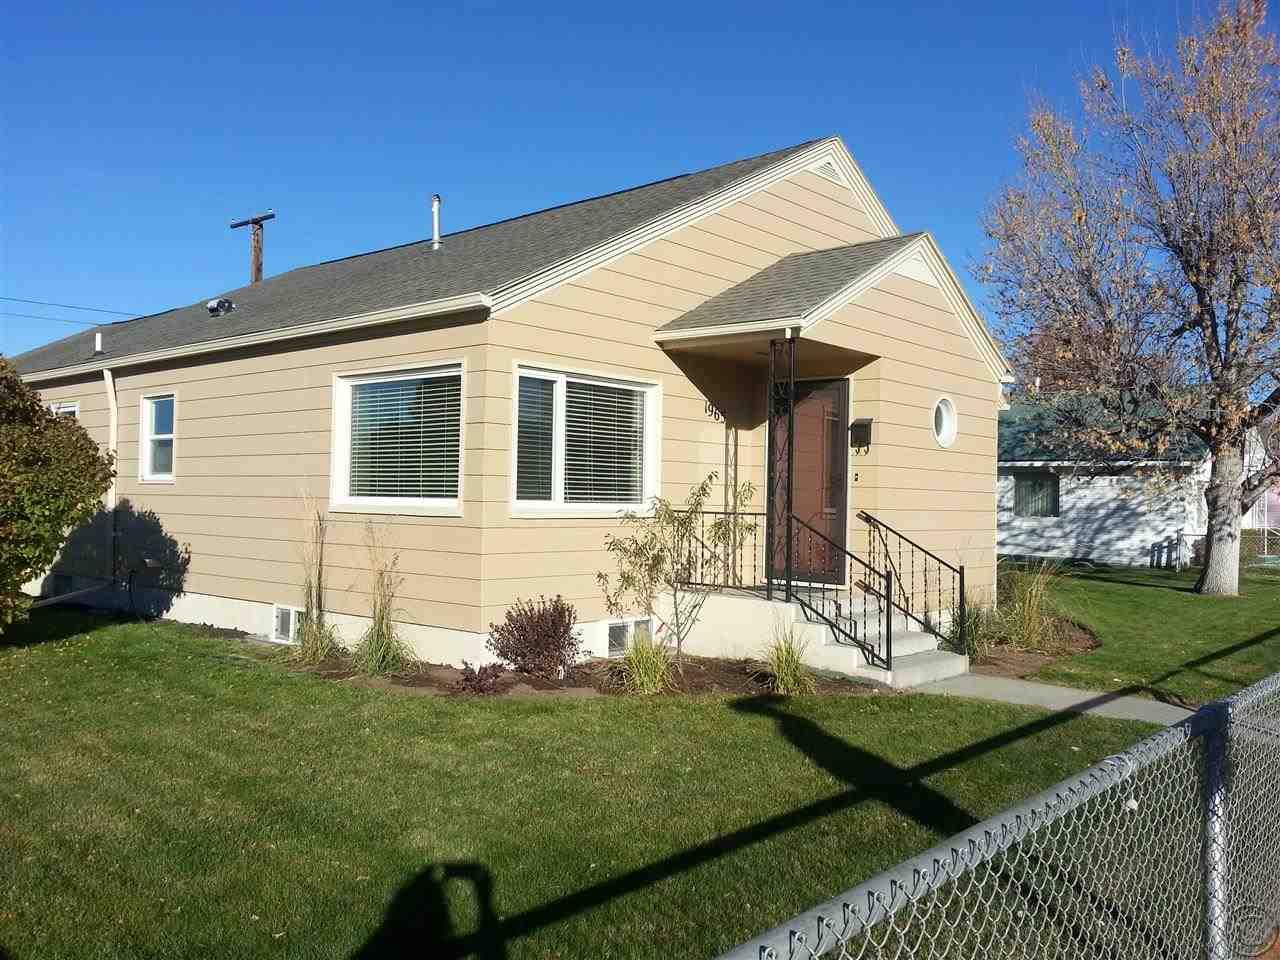 1965 Whitman Ave, Butte, MT 59701